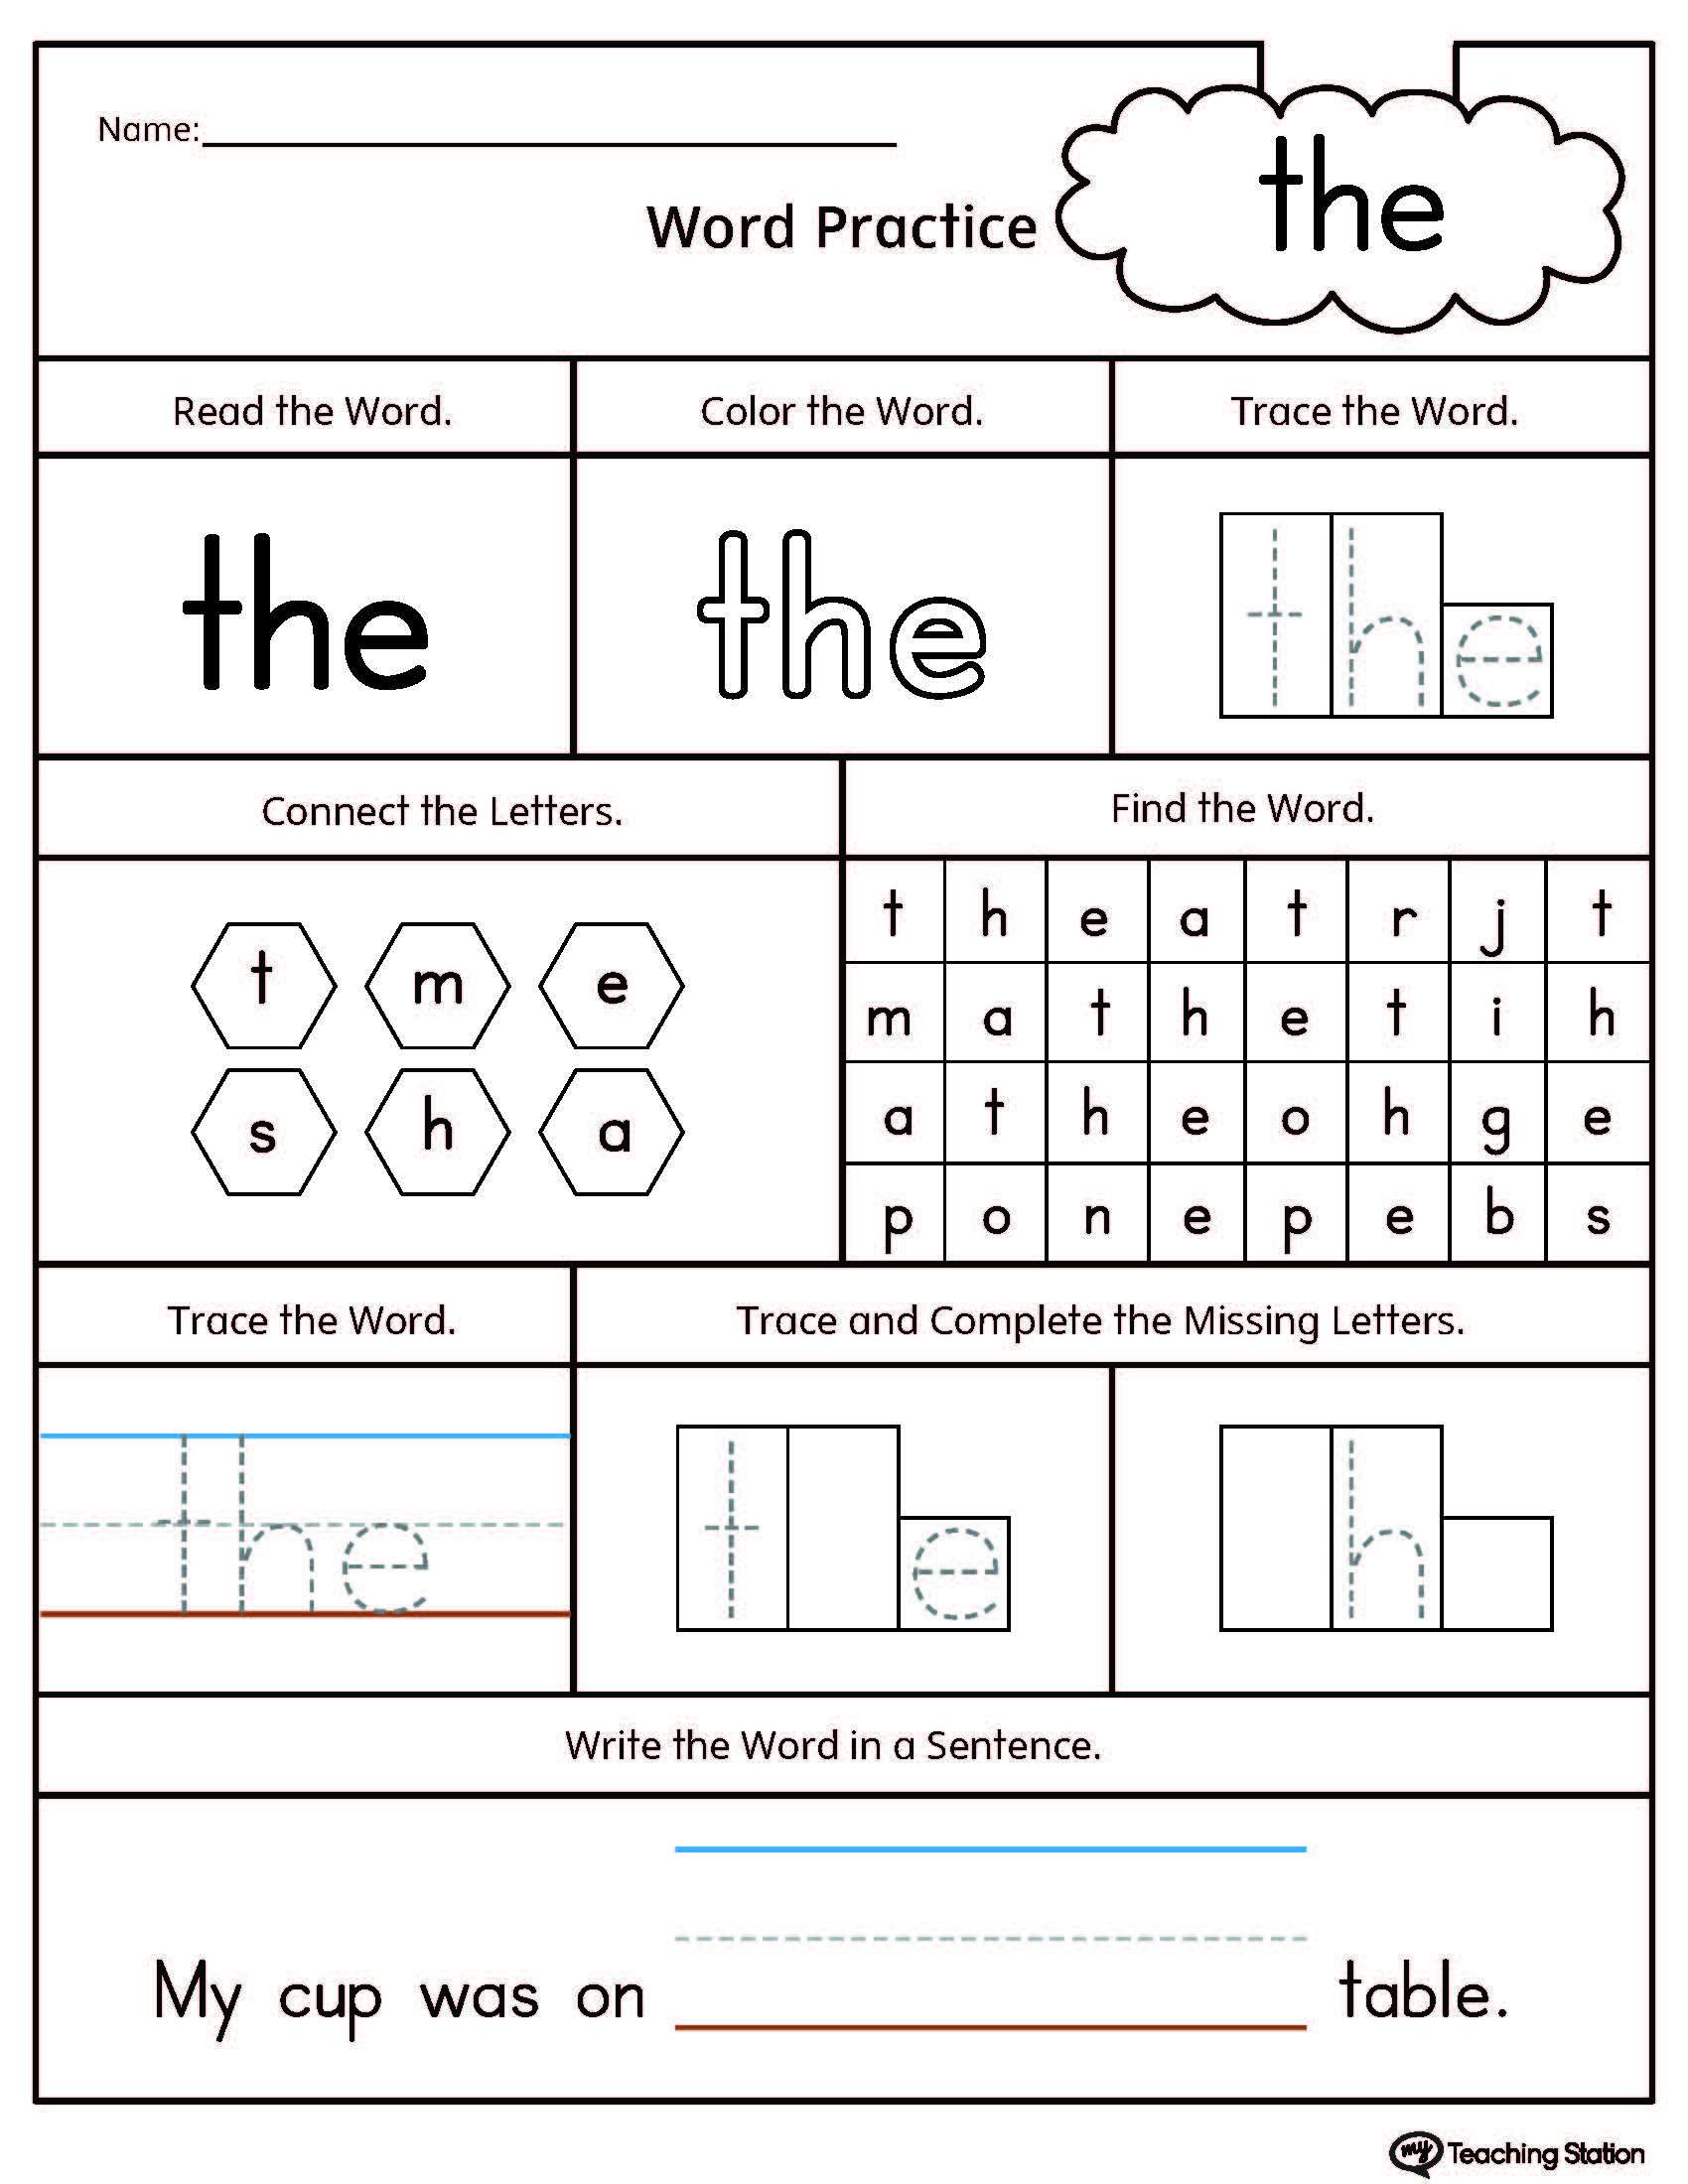 Kindergarten Sight Words Worksheets Sight Word the Printable Worksheet